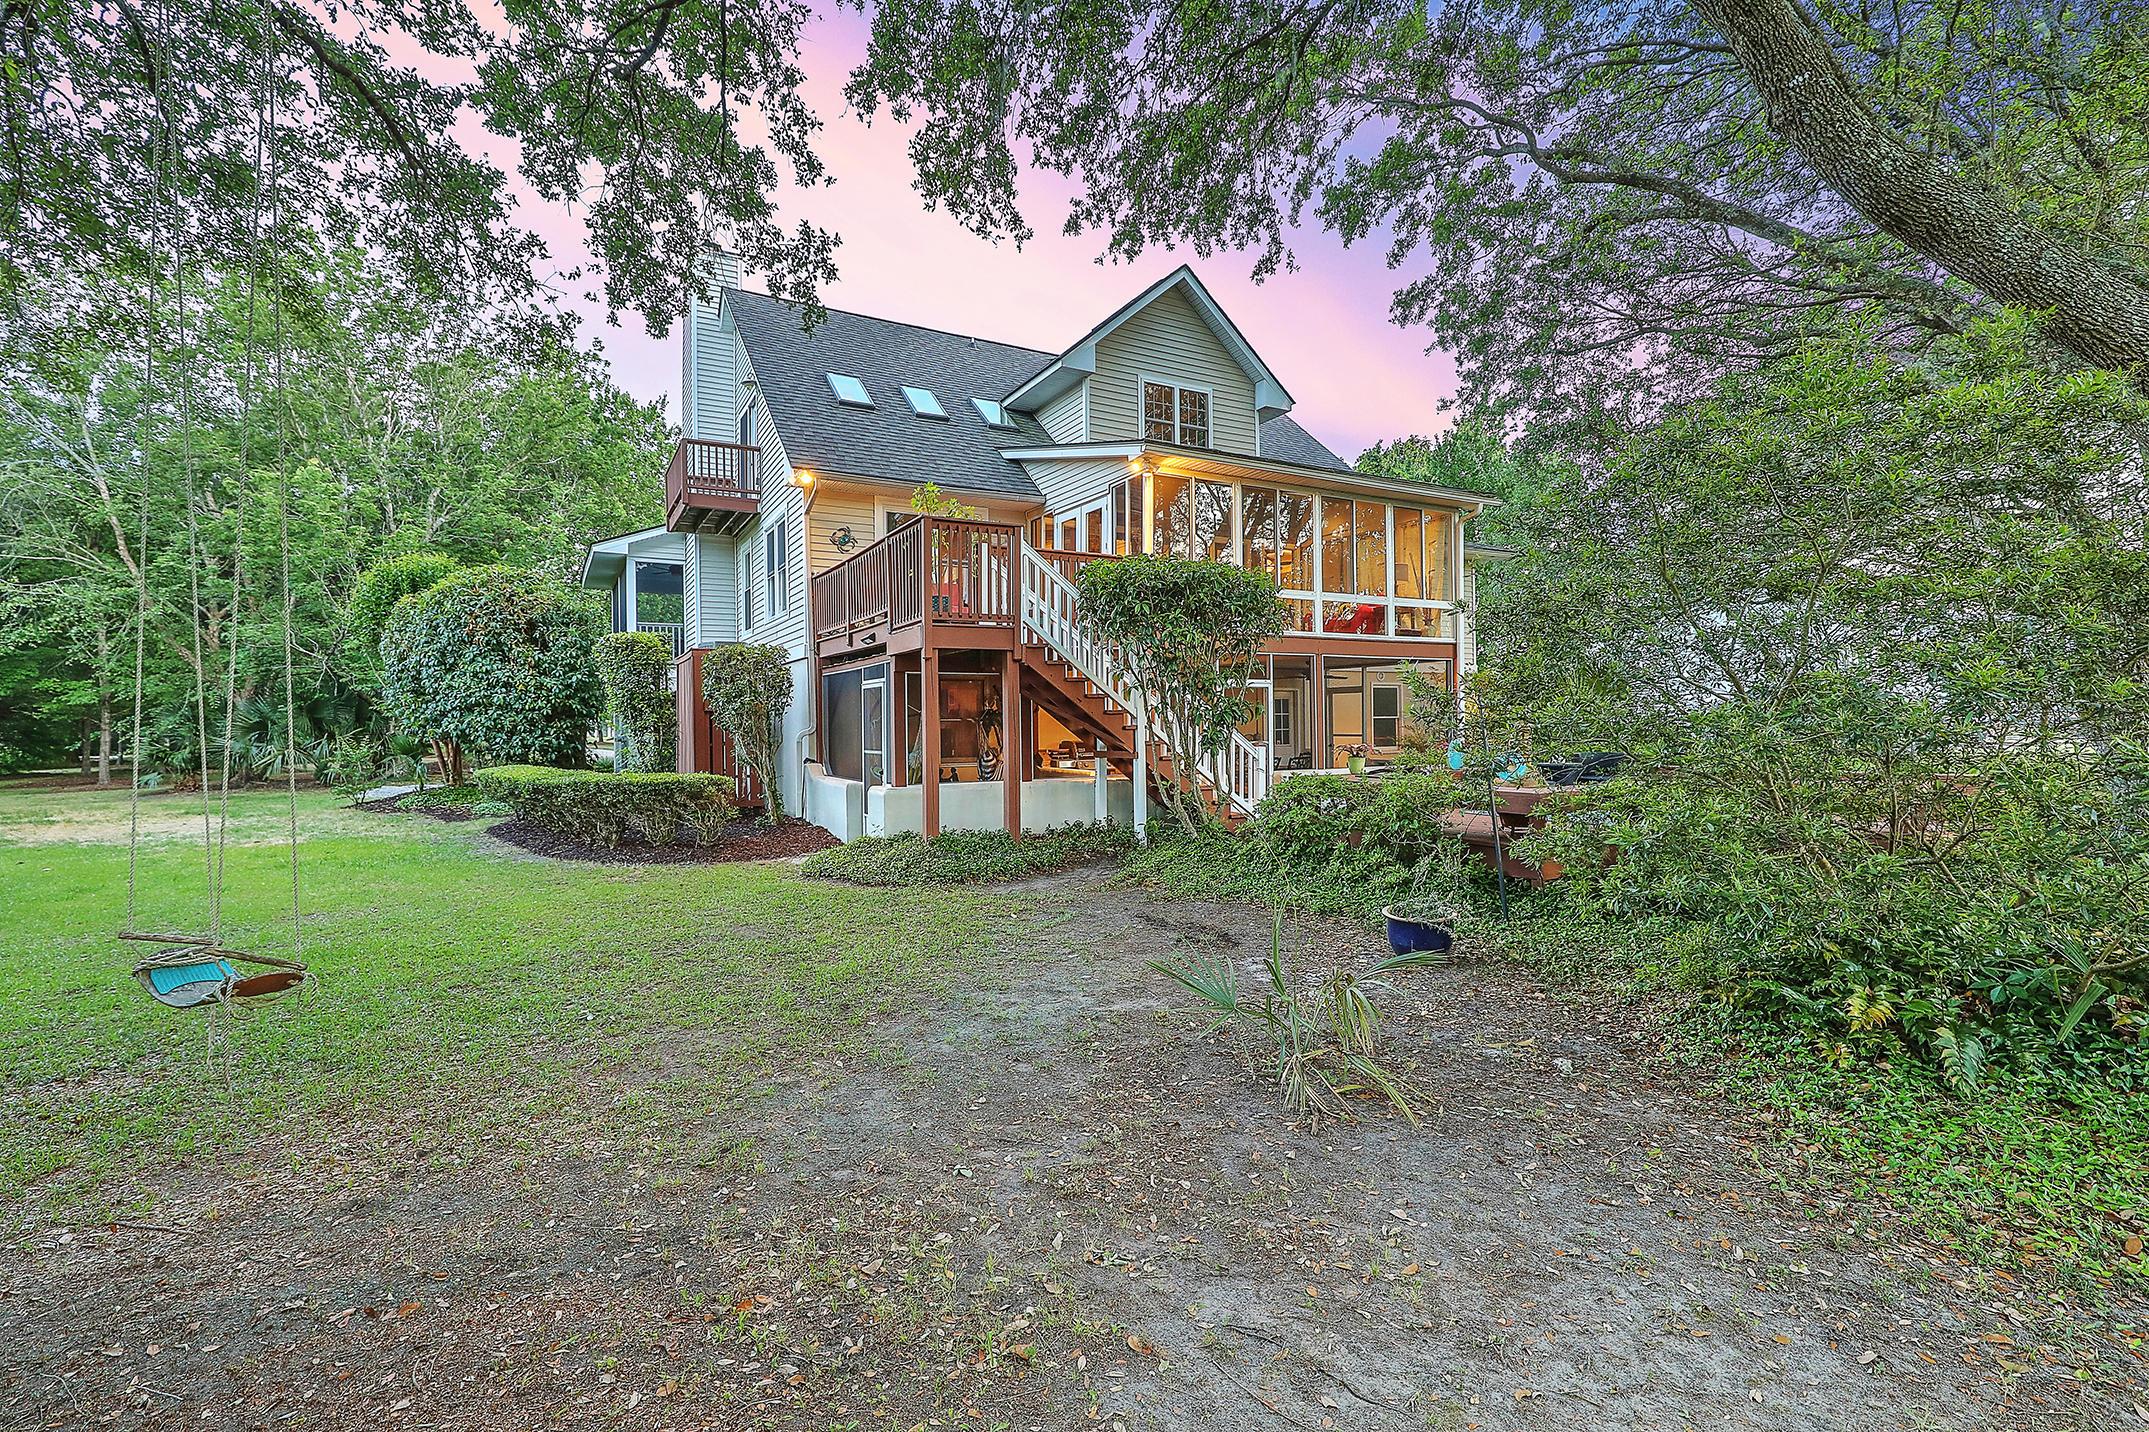 Stono Pointe Homes For Sale - 2660 Burden Creek, Johns Island, SC - 10